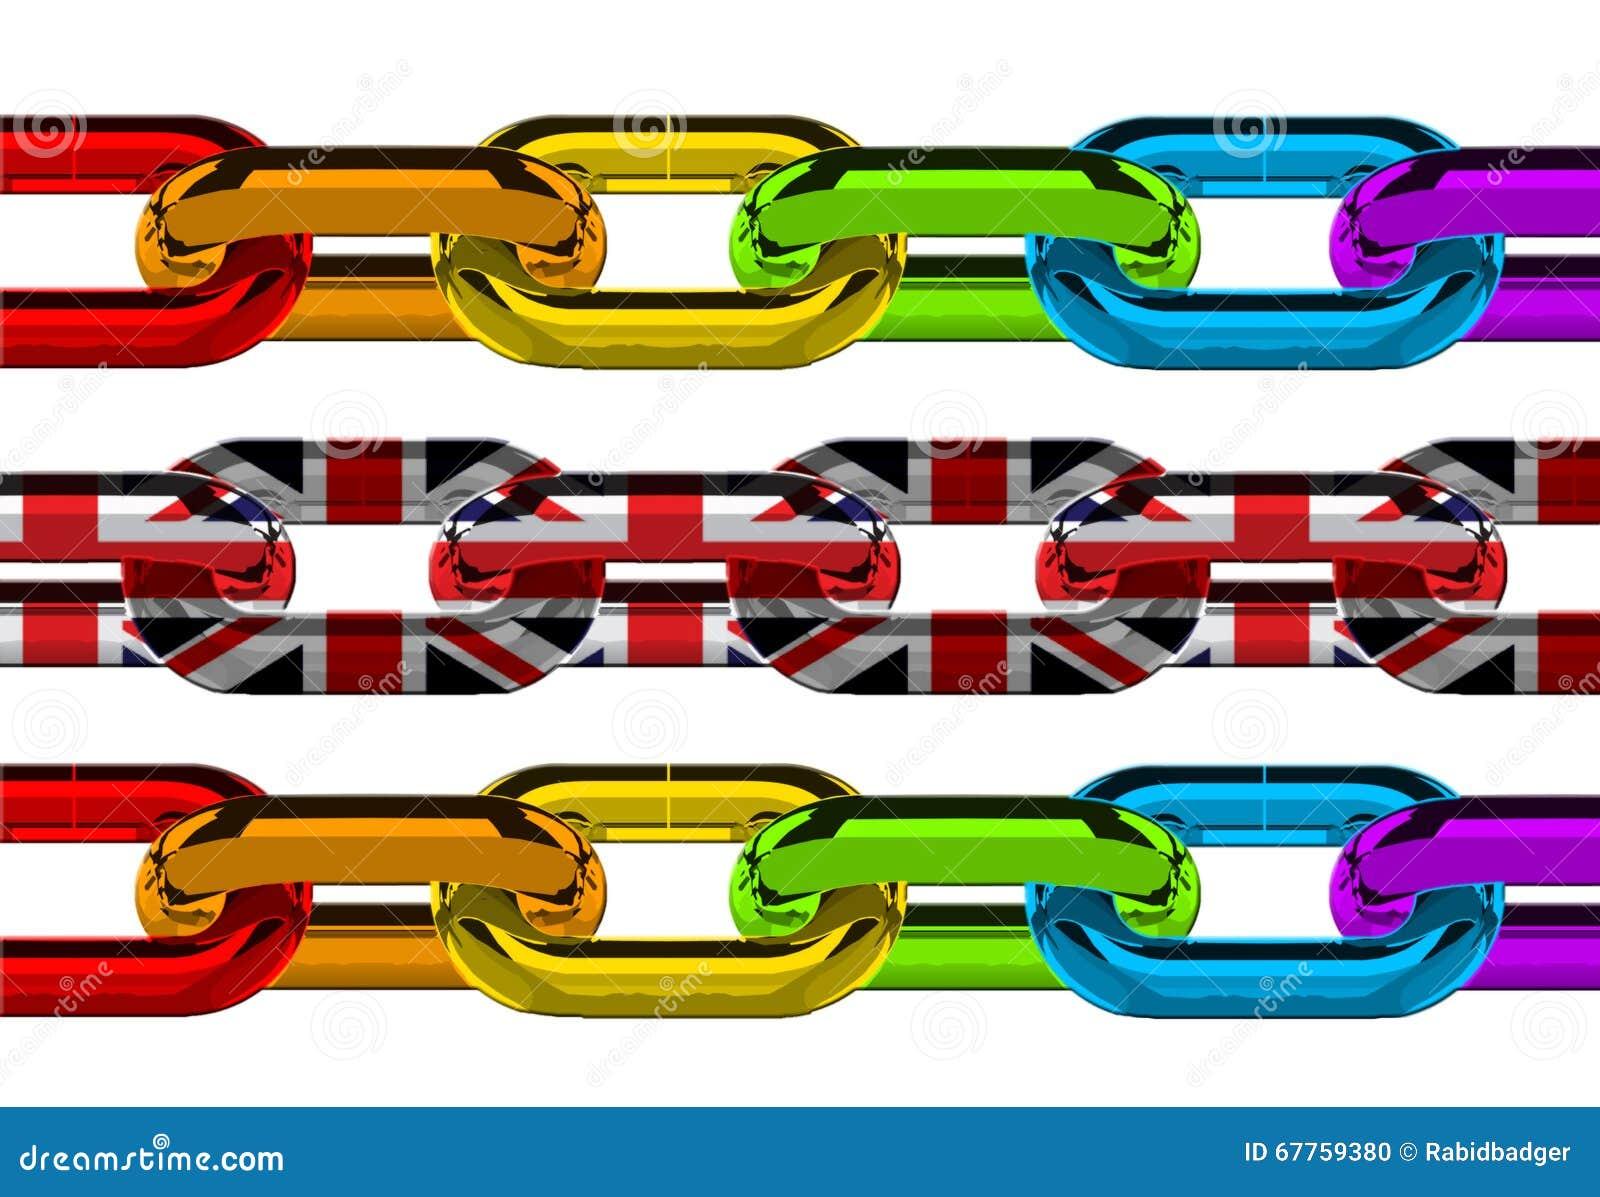 Free gay links